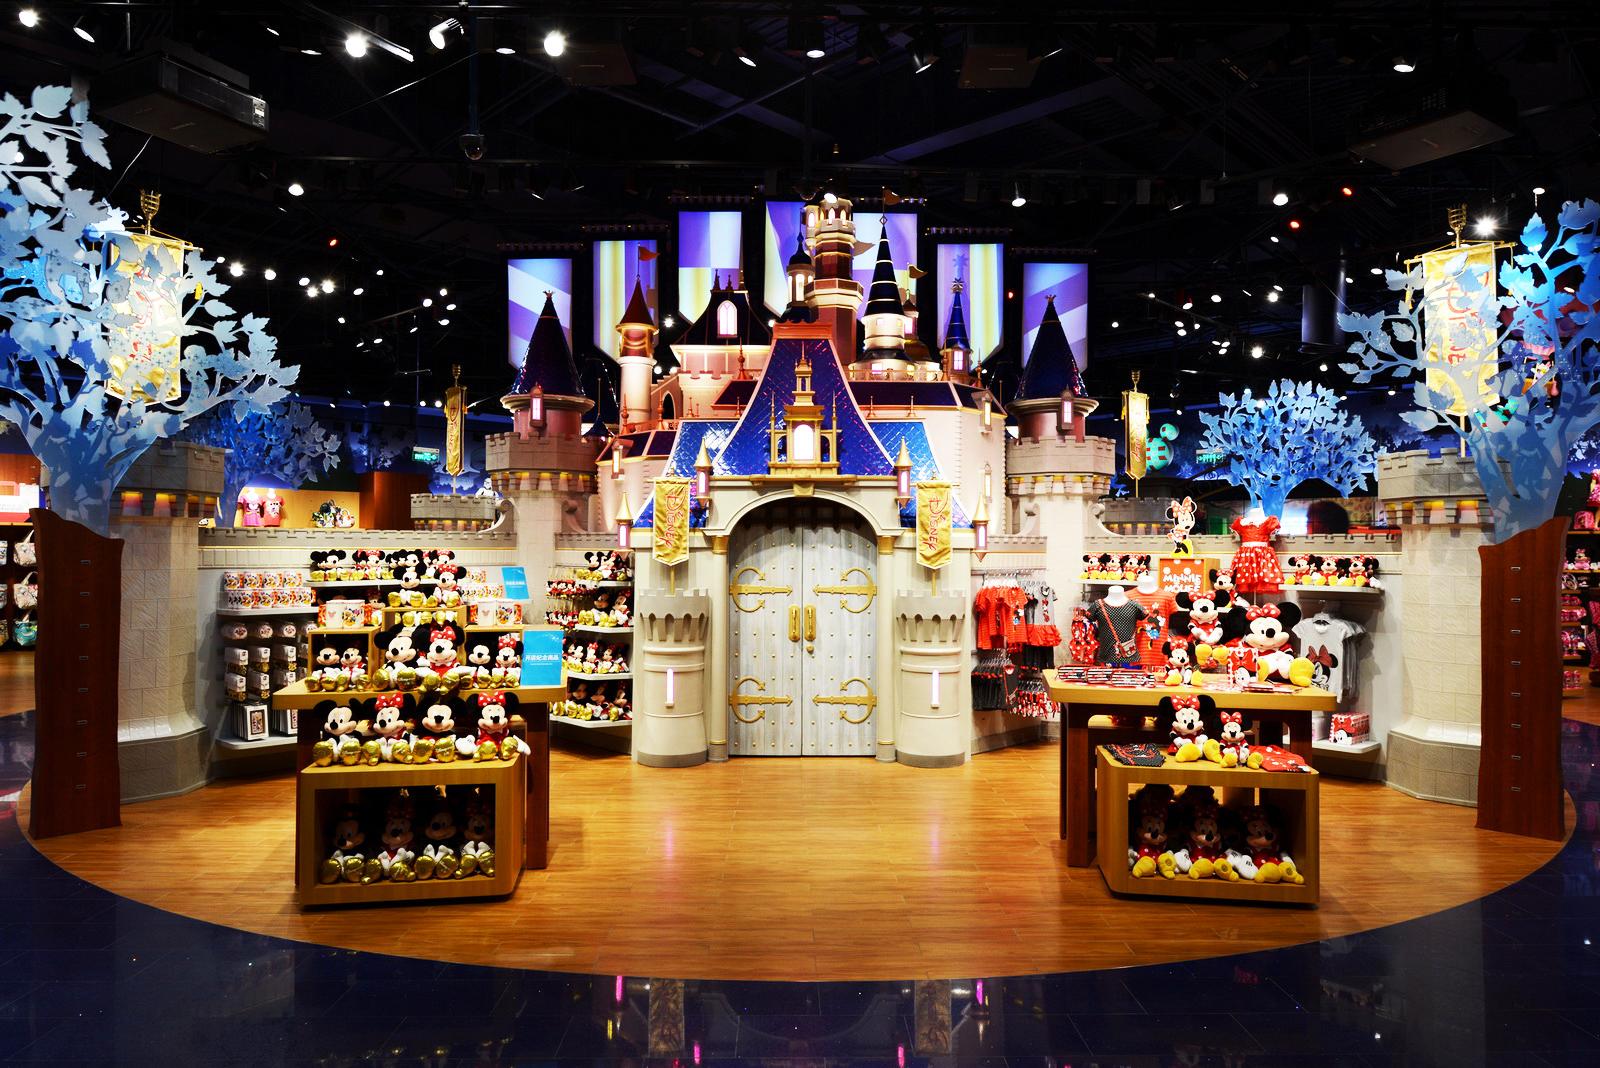 Image Disney Store Shanghai 02 Jpg Disney Wiki